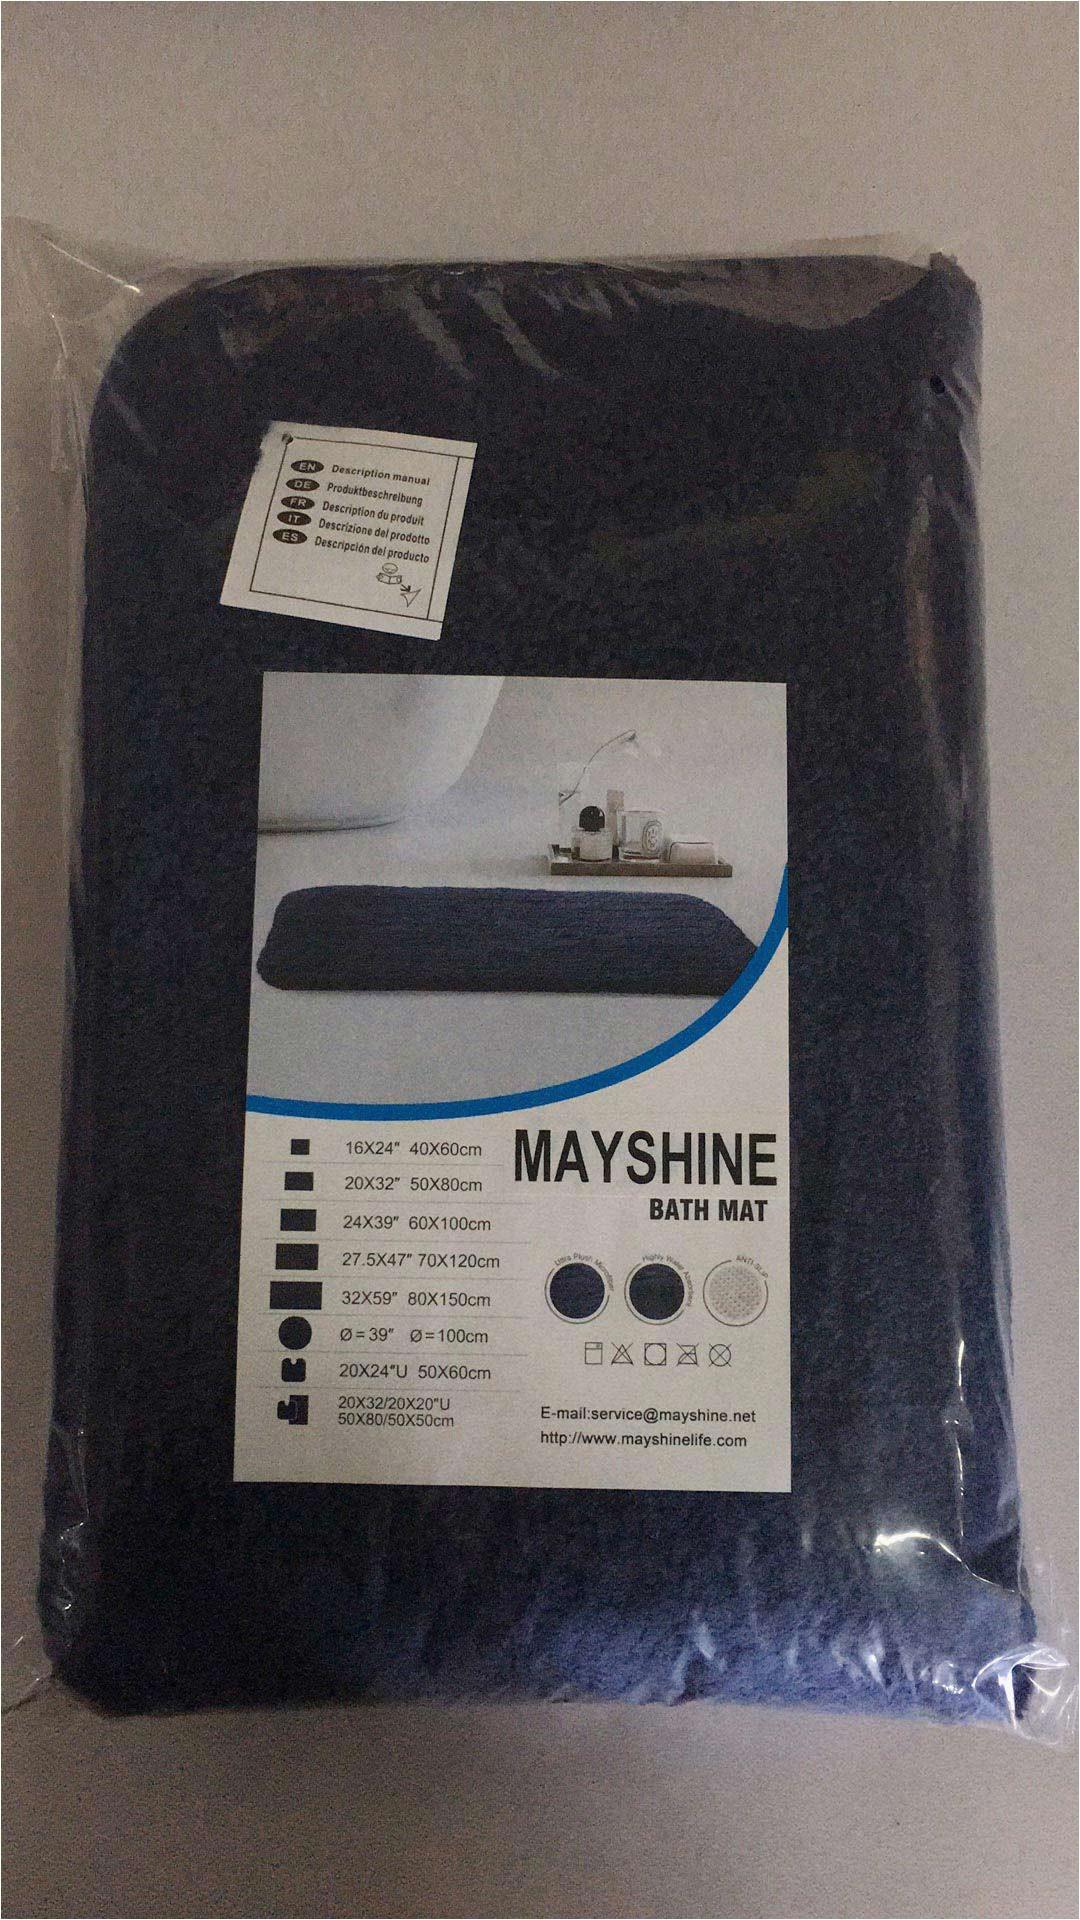 Navy Blue Bathroom Rug Runner Mayshine Mayshine 20×32 Inch Non Slip Bathroom Rug Runner